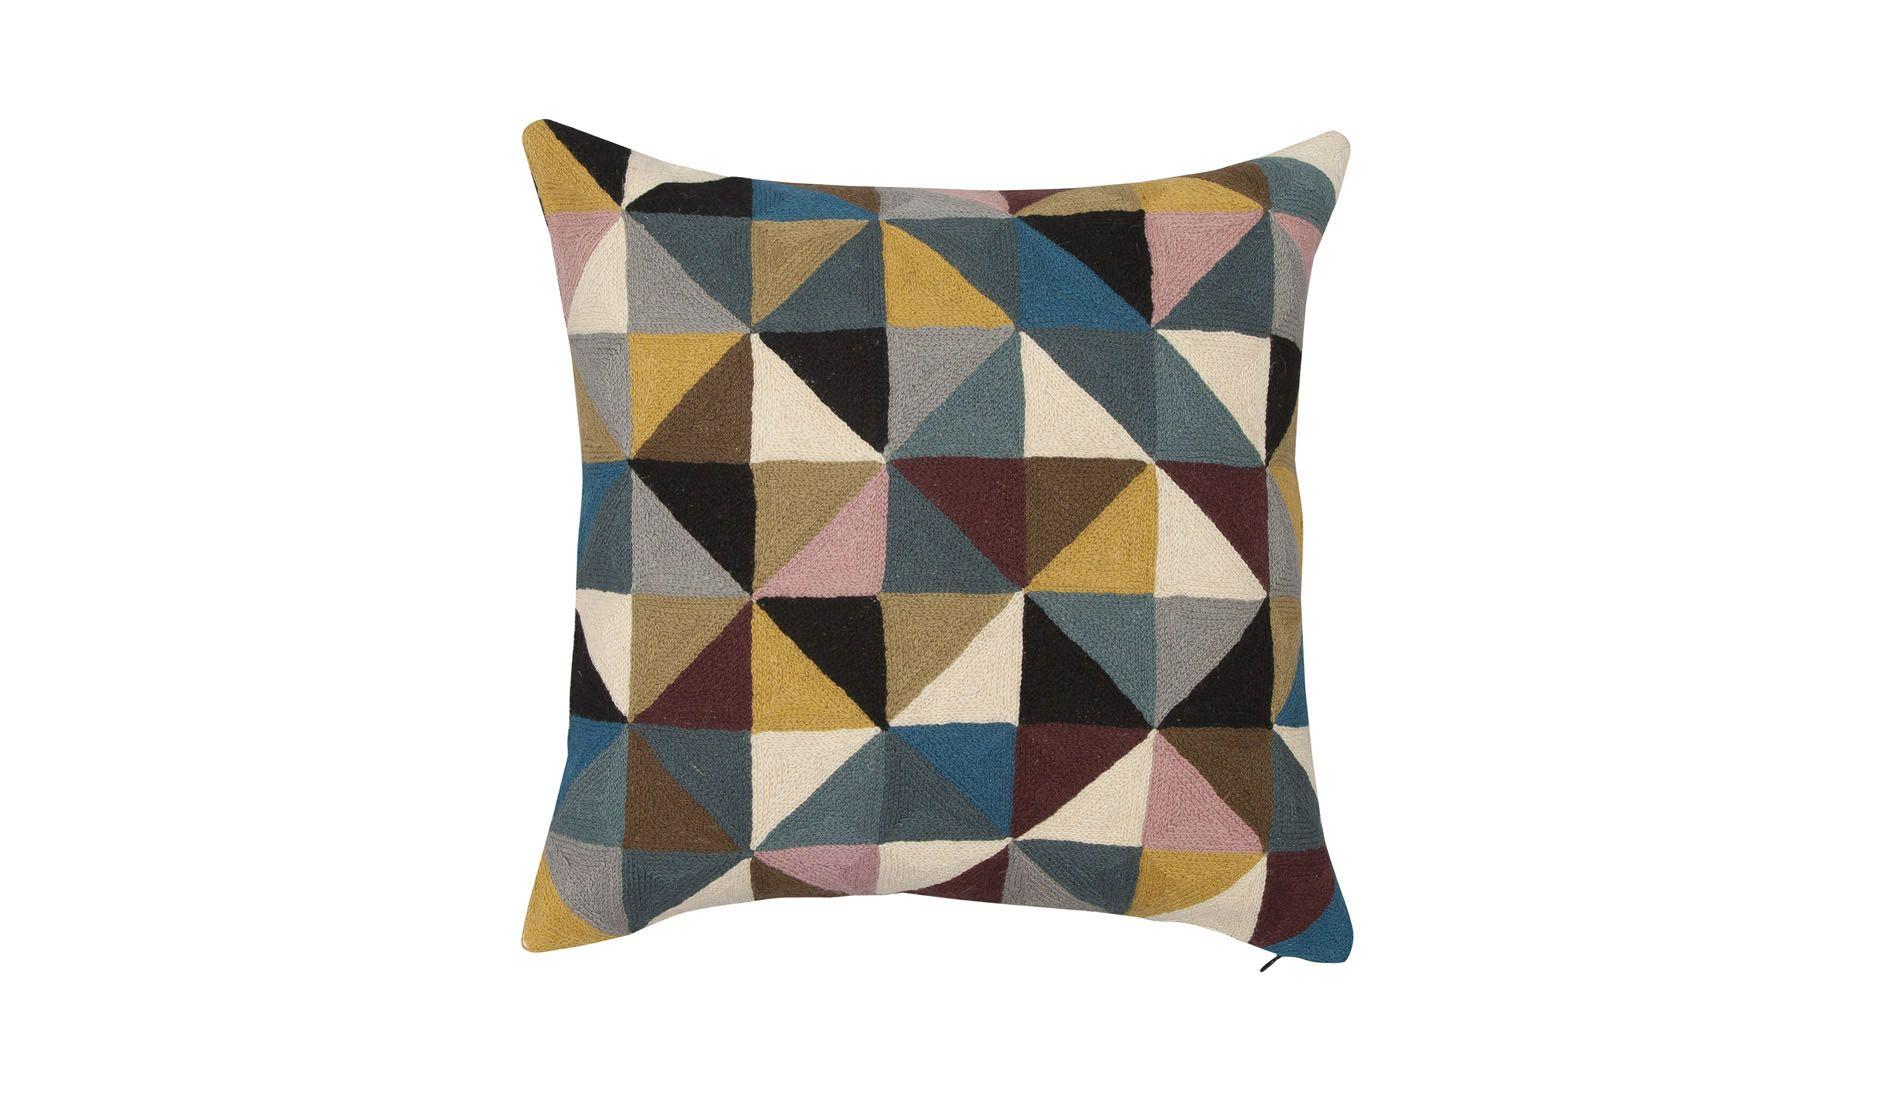 niki jones harlequin kissen 50x50 cm home pinterest. Black Bedroom Furniture Sets. Home Design Ideas